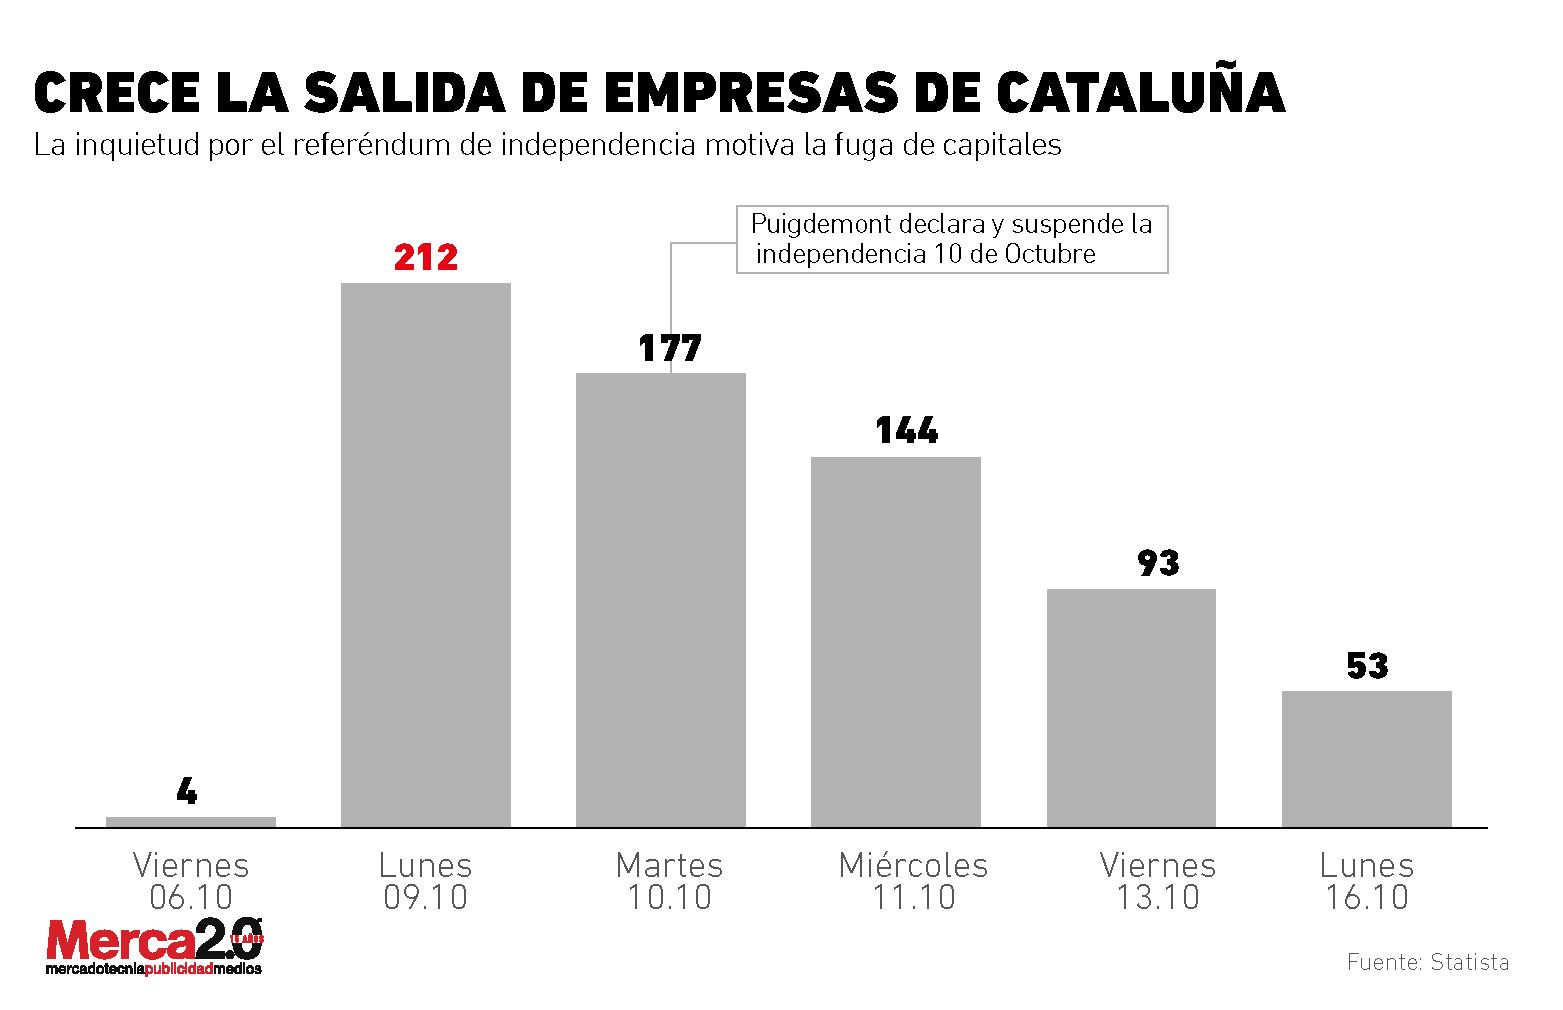 empresas de cataluna-01